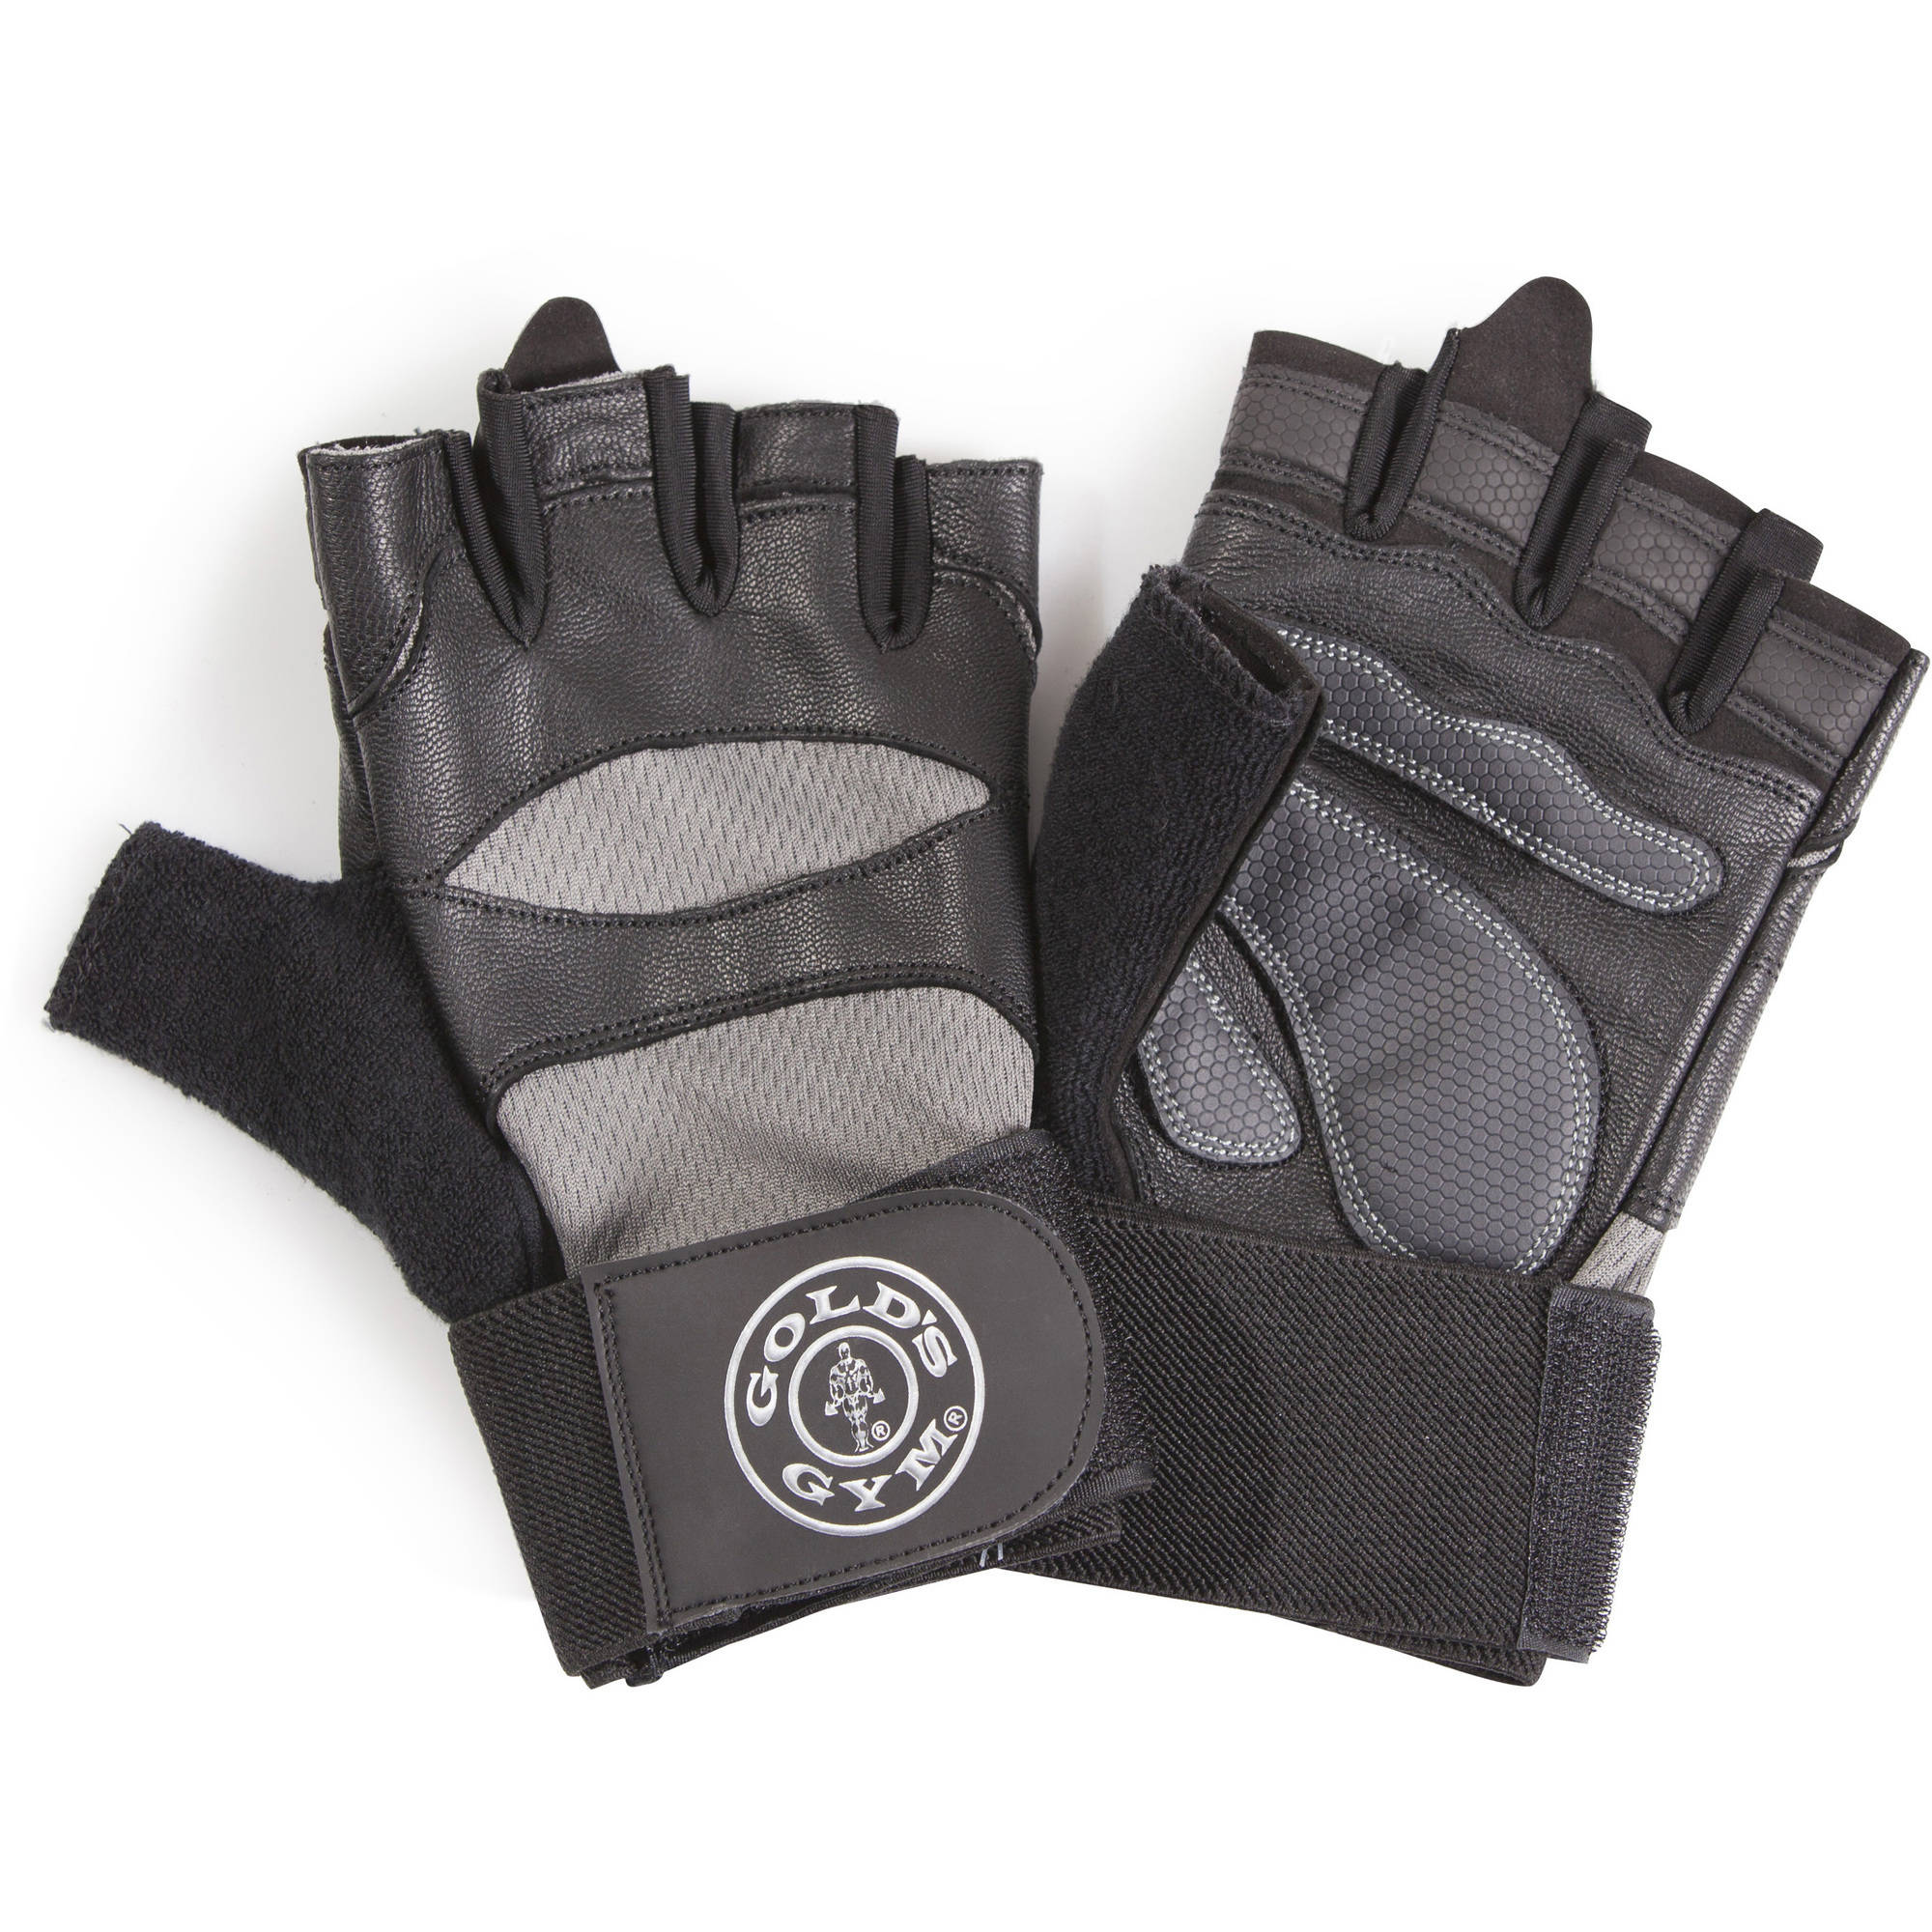 Hand Wrap Gloves Golds Gym Elite Wrist Wrap Gloves Walmartcom